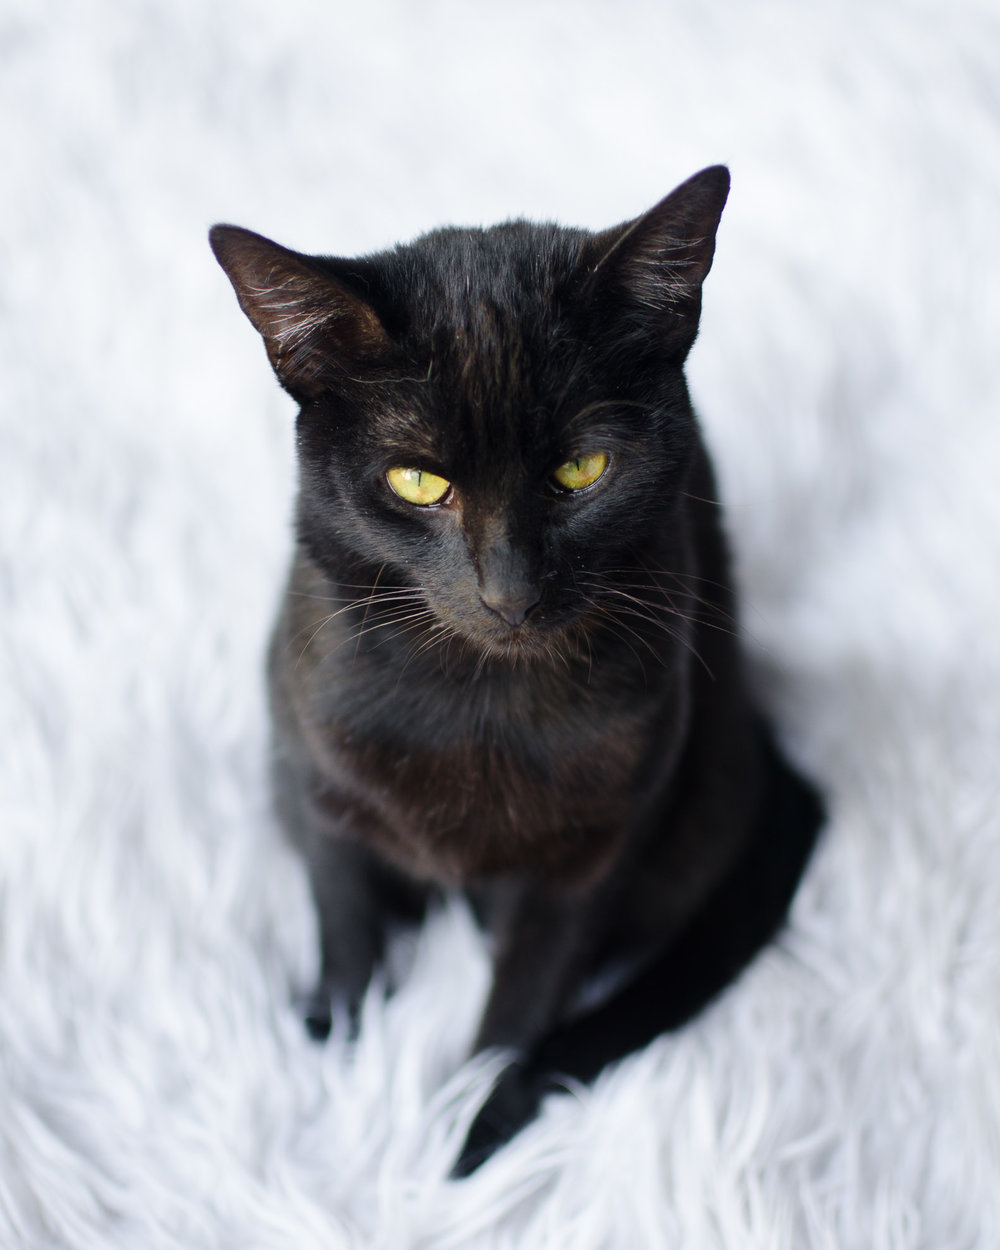 Crumbs & Whiskers Cat Cafe Los Angeles Santa Barbara Photographer Miranda Kelton Photography-1.jpg